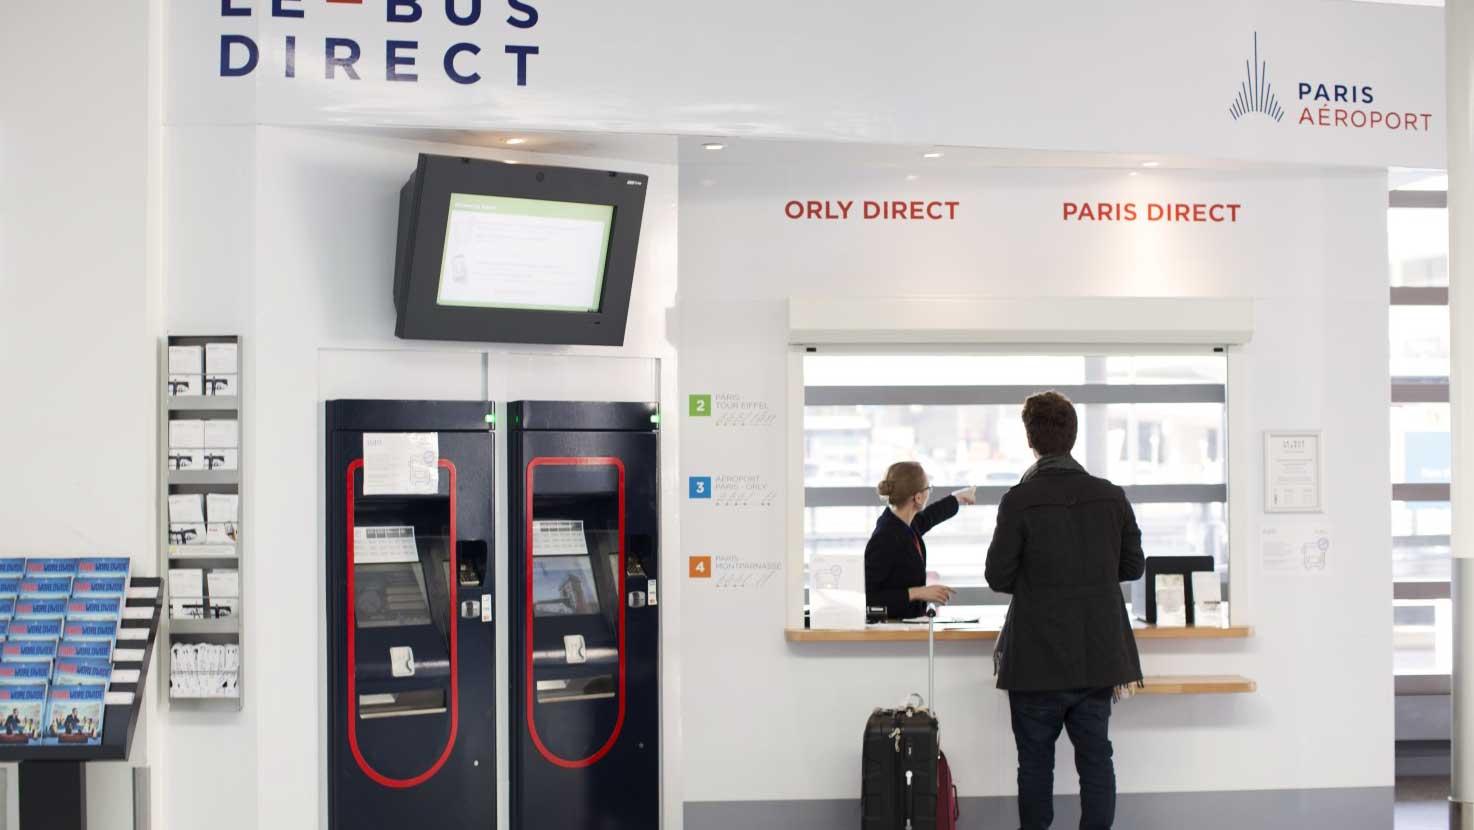 Стойка продажи билетов Le Bus Direct